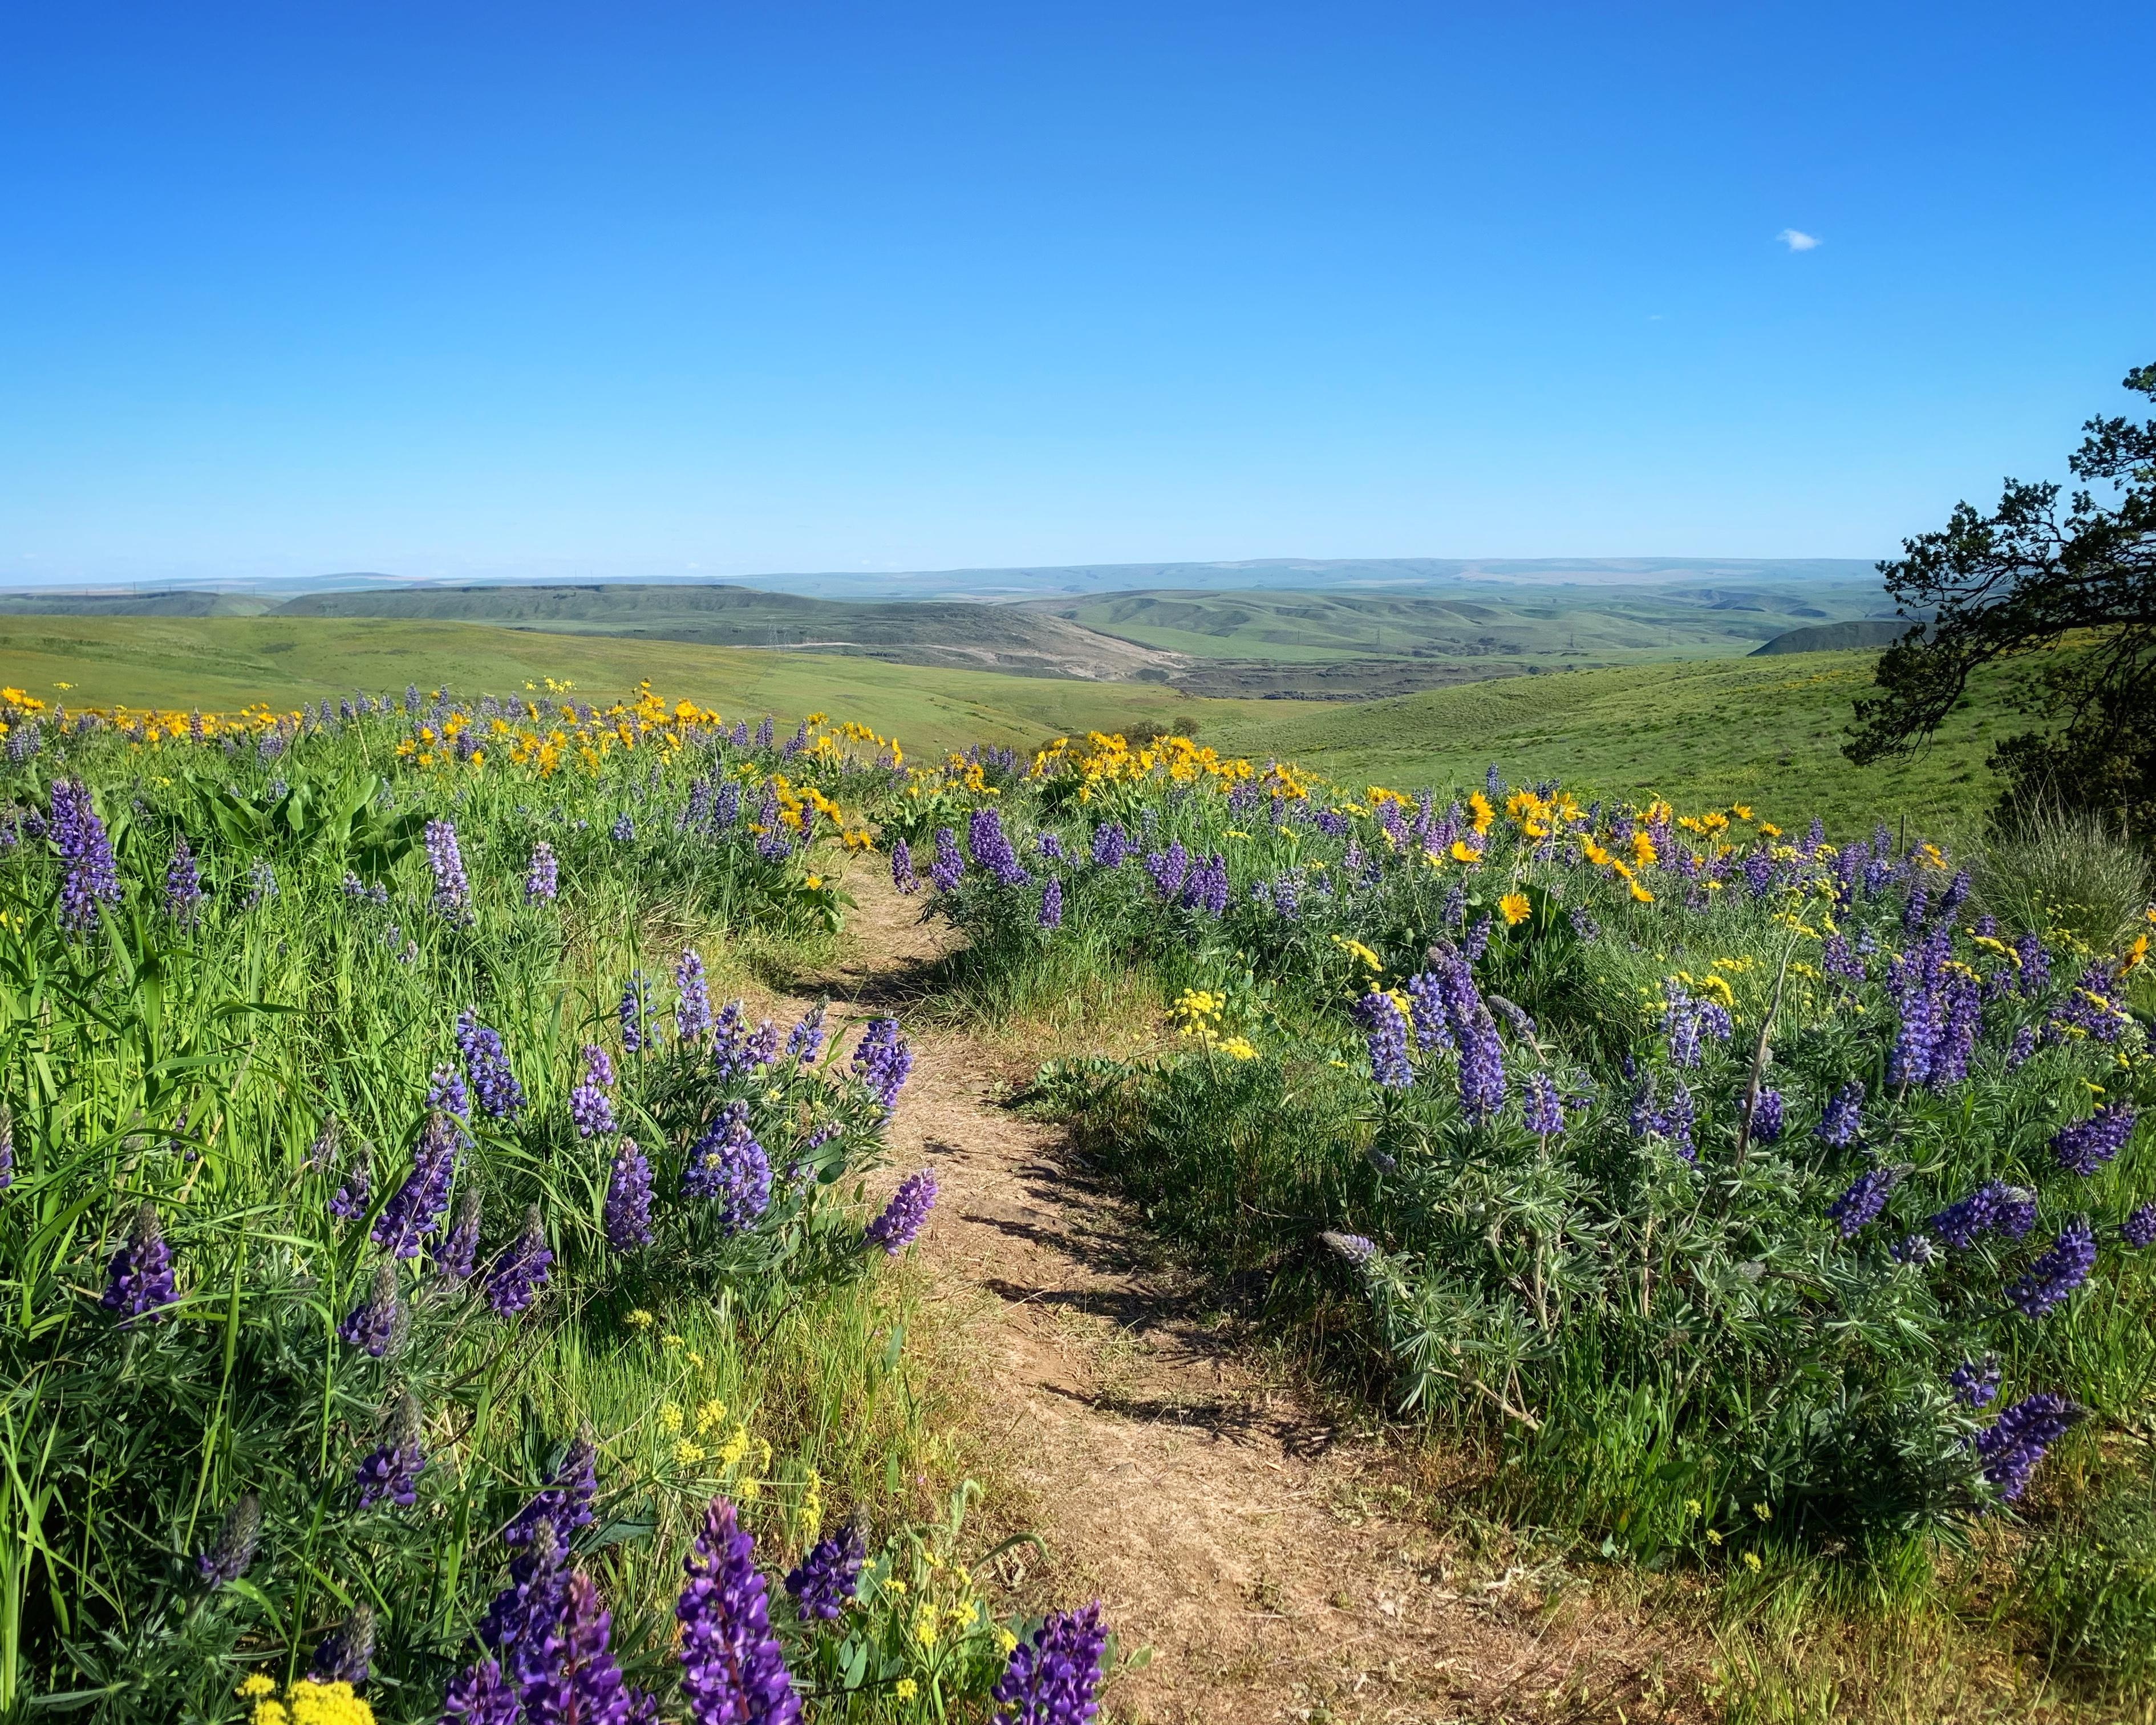 purple and yellow wildflowers along hiking trail